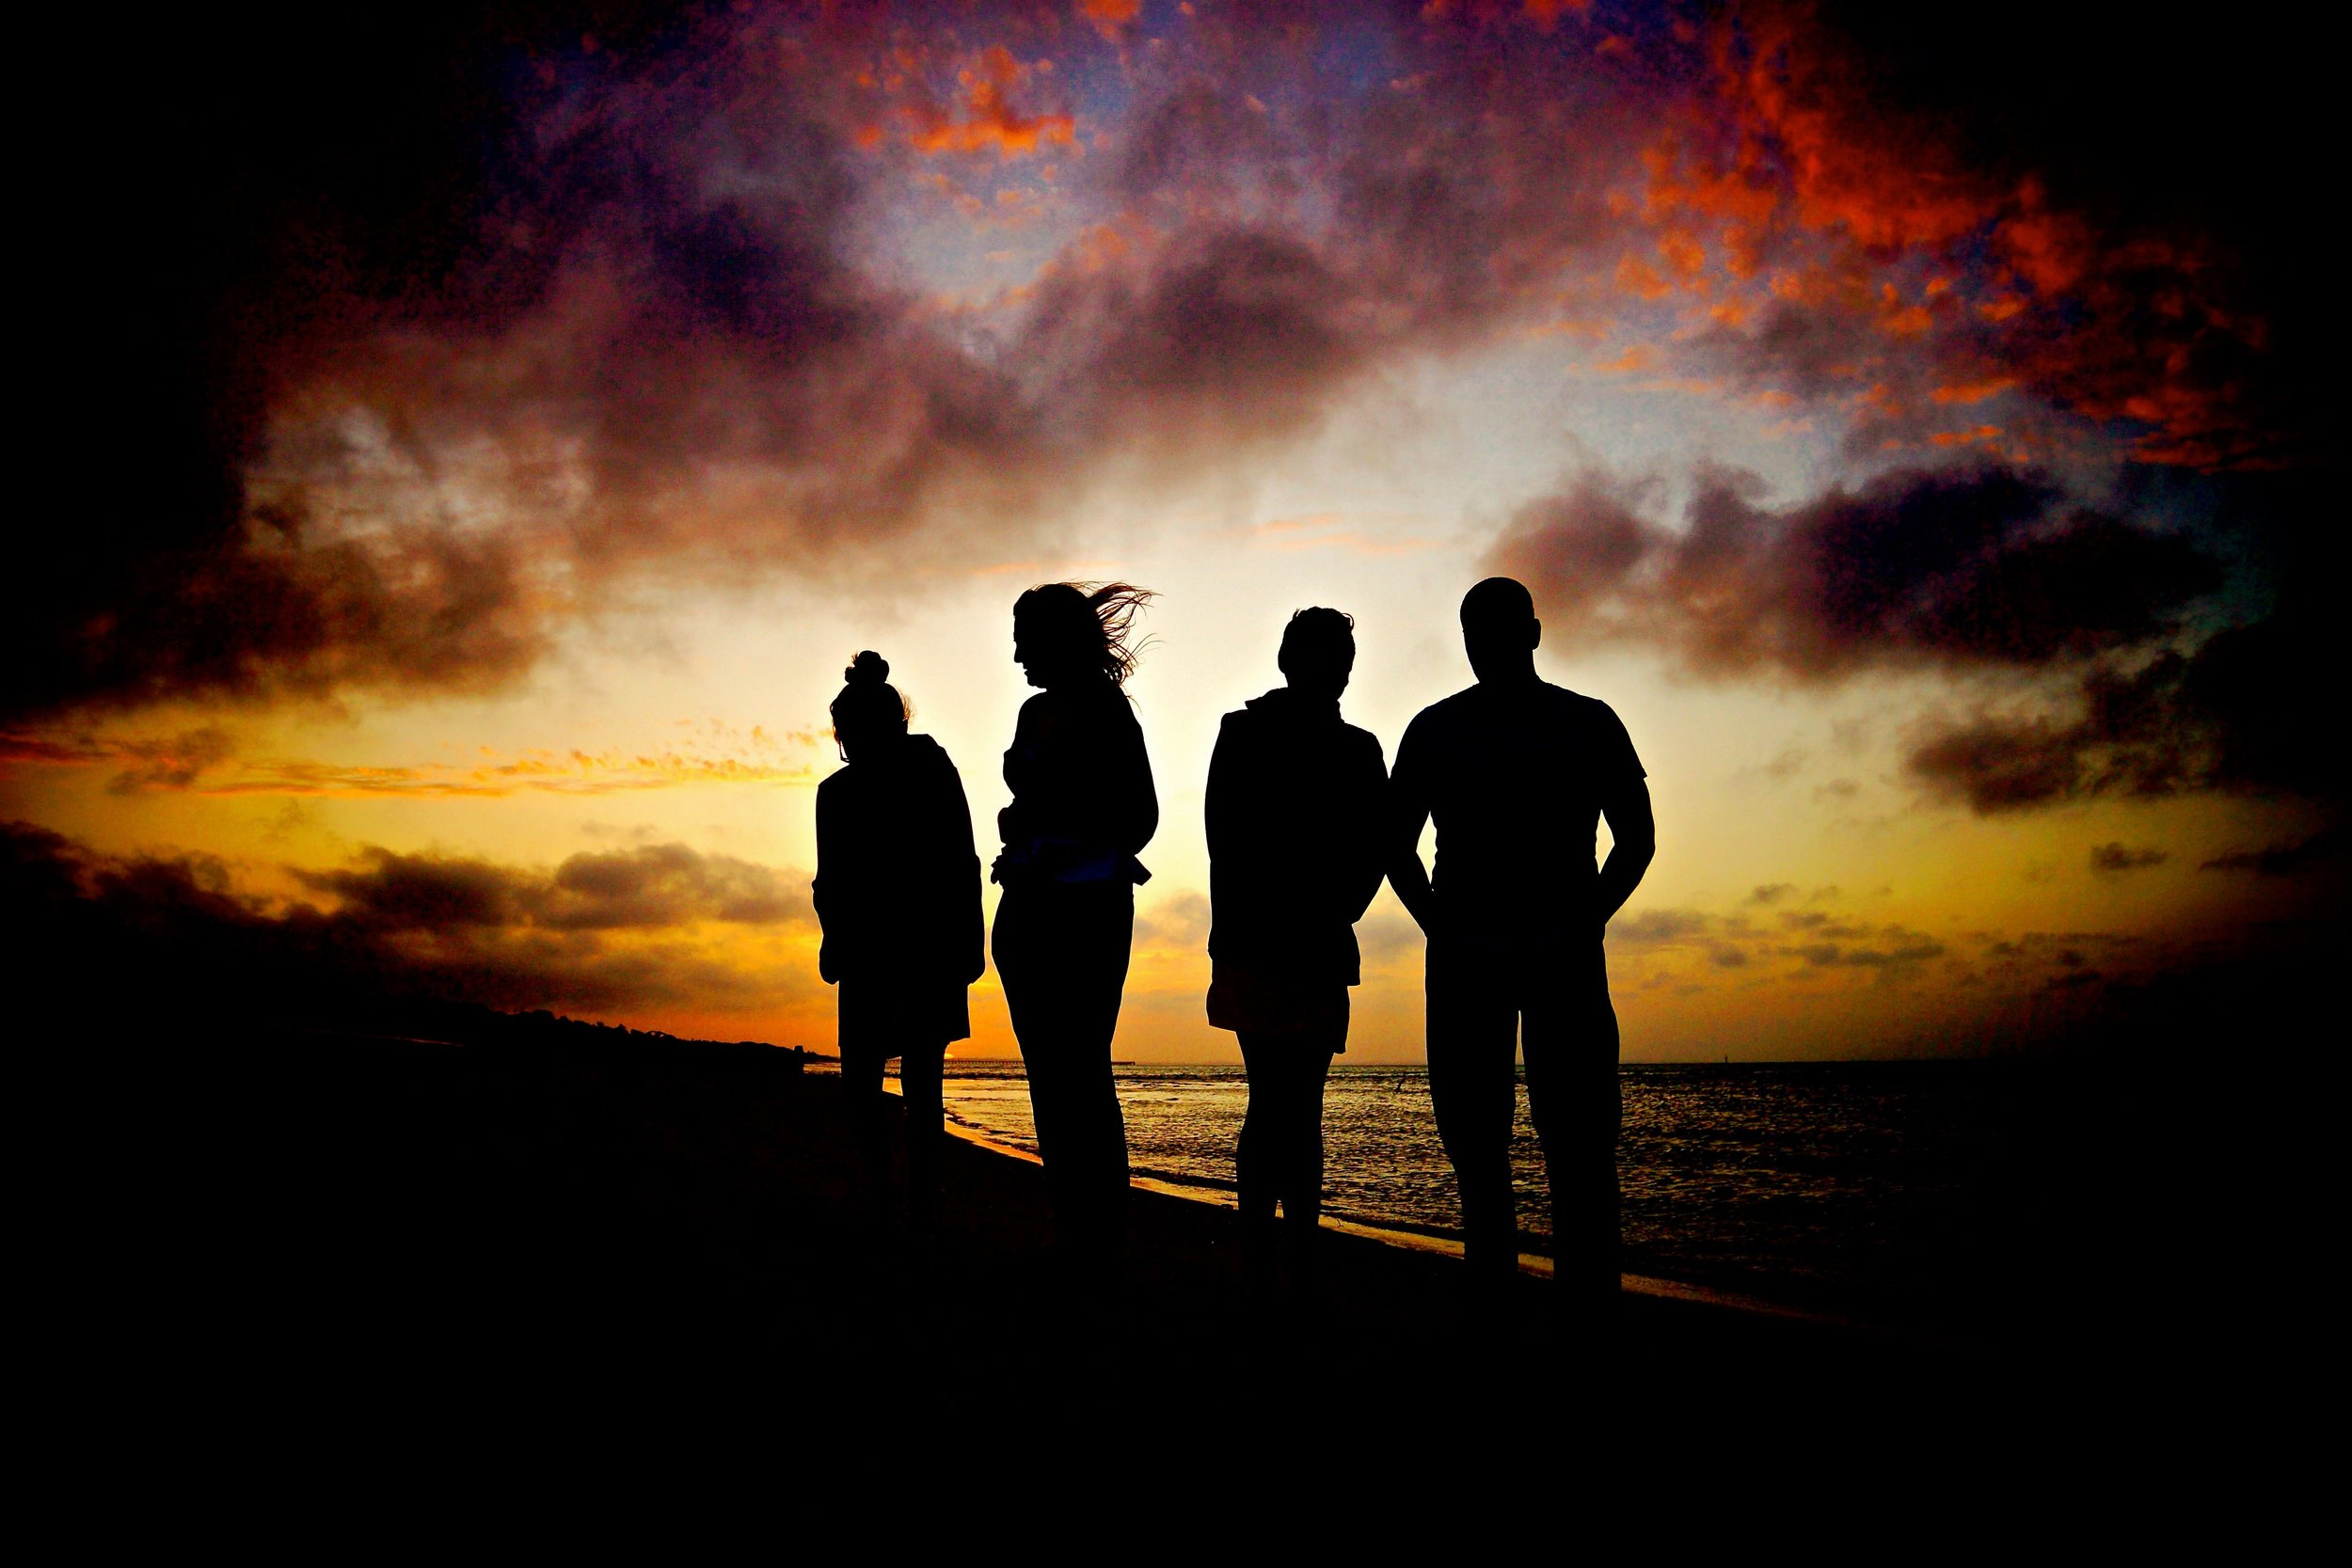 sunset-silhouettes-6000x4000.jpg